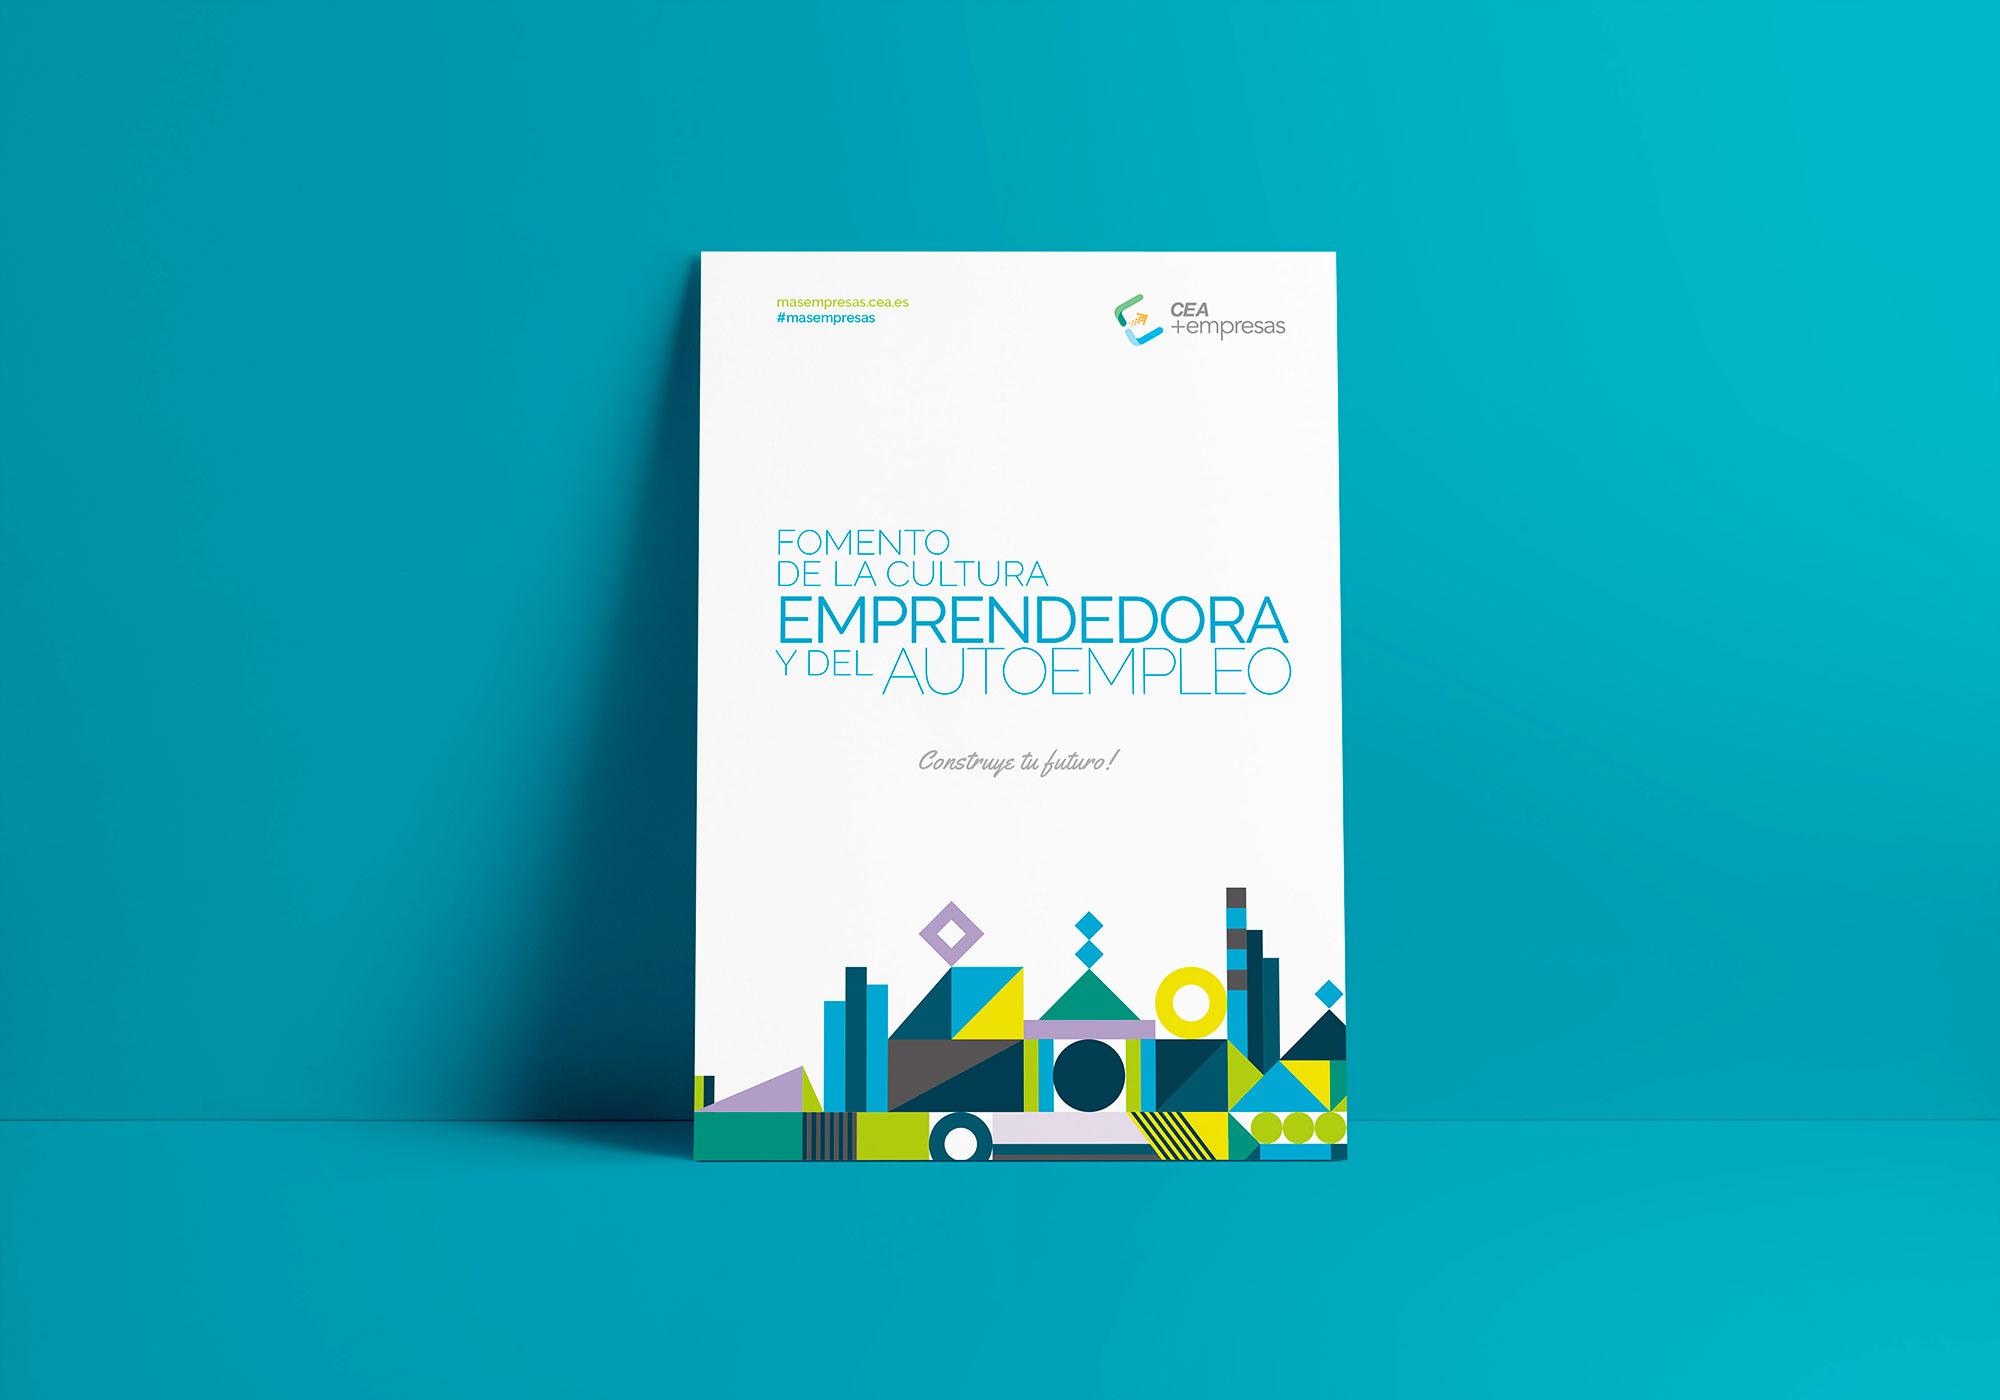 Folleto CEA Fomento de la Cultura Emprendedora